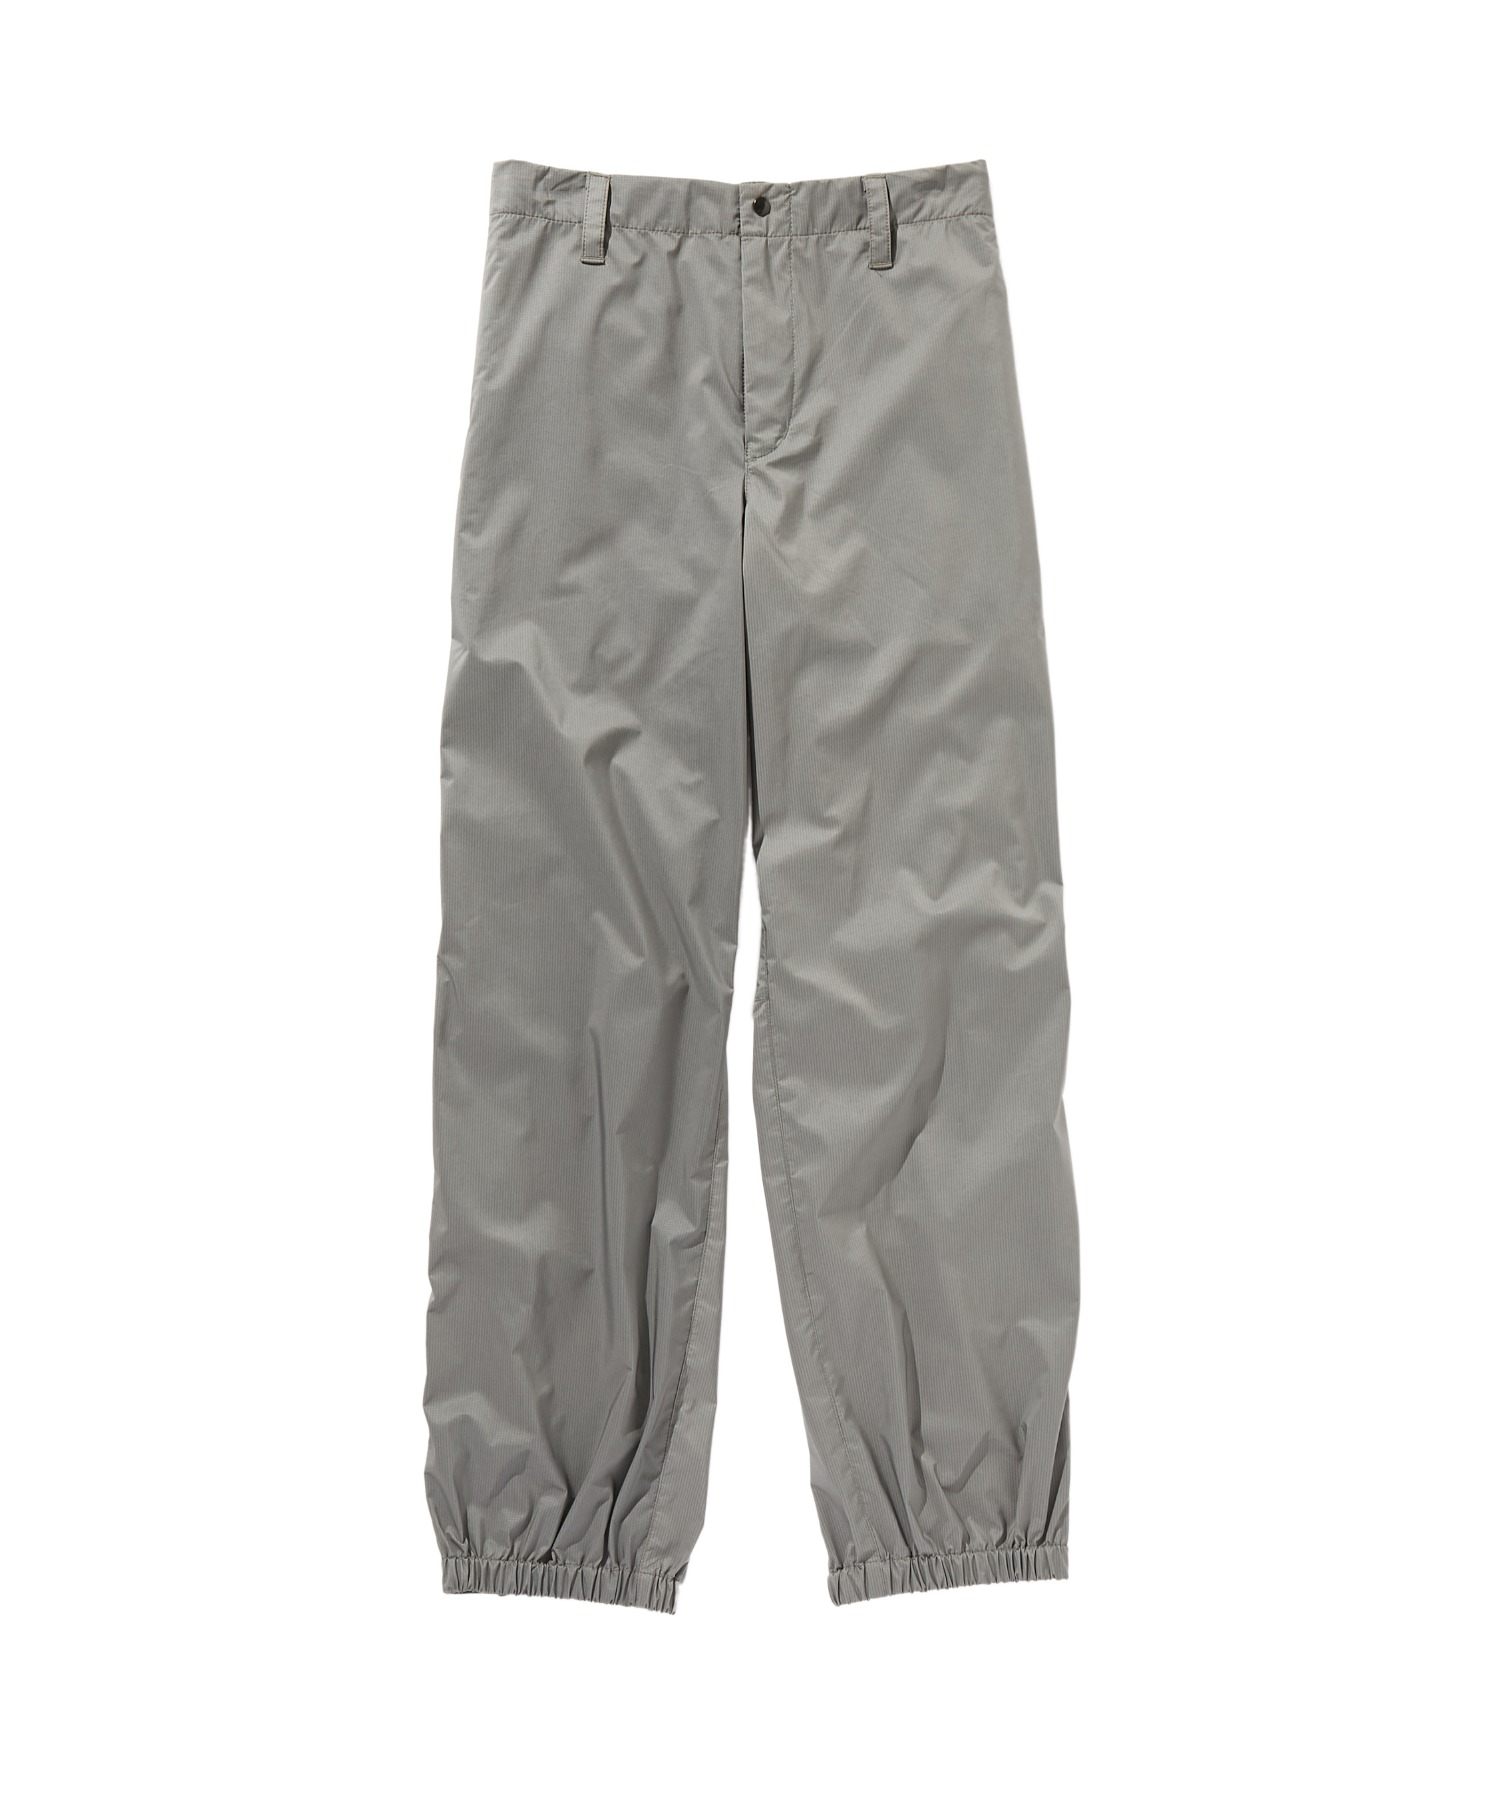 SPRING2020 TRACK PANTS